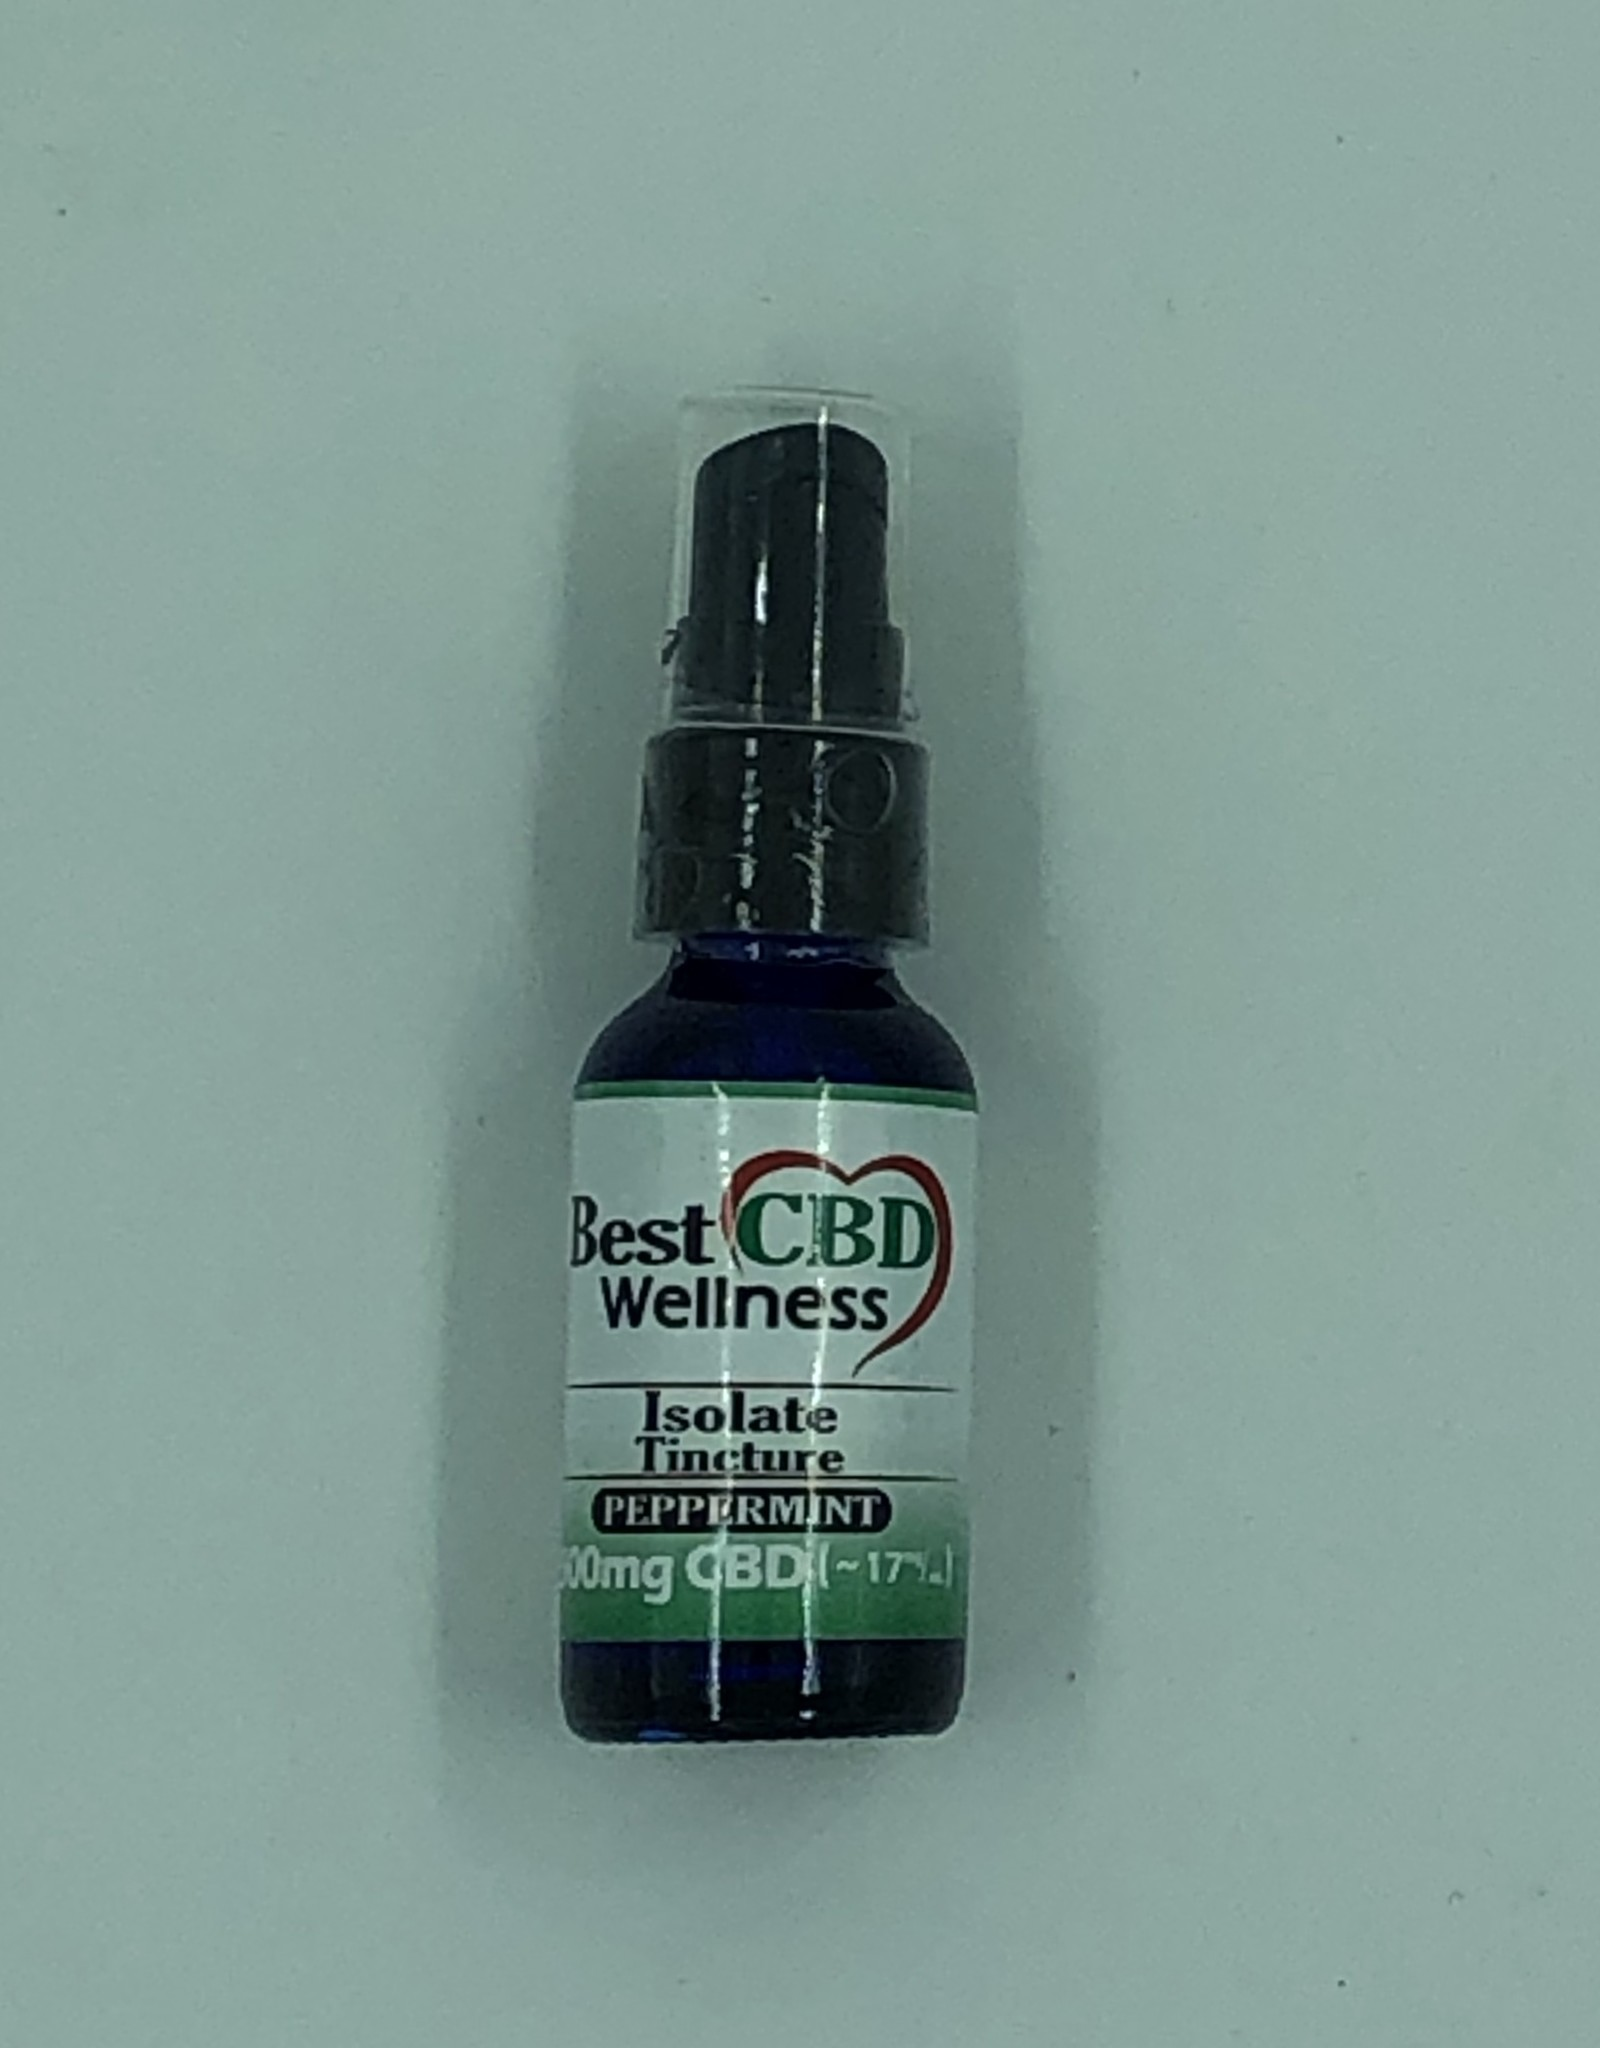 Best CBD Wellness Isolate CBD Oil Tincture 500mg Peppermint